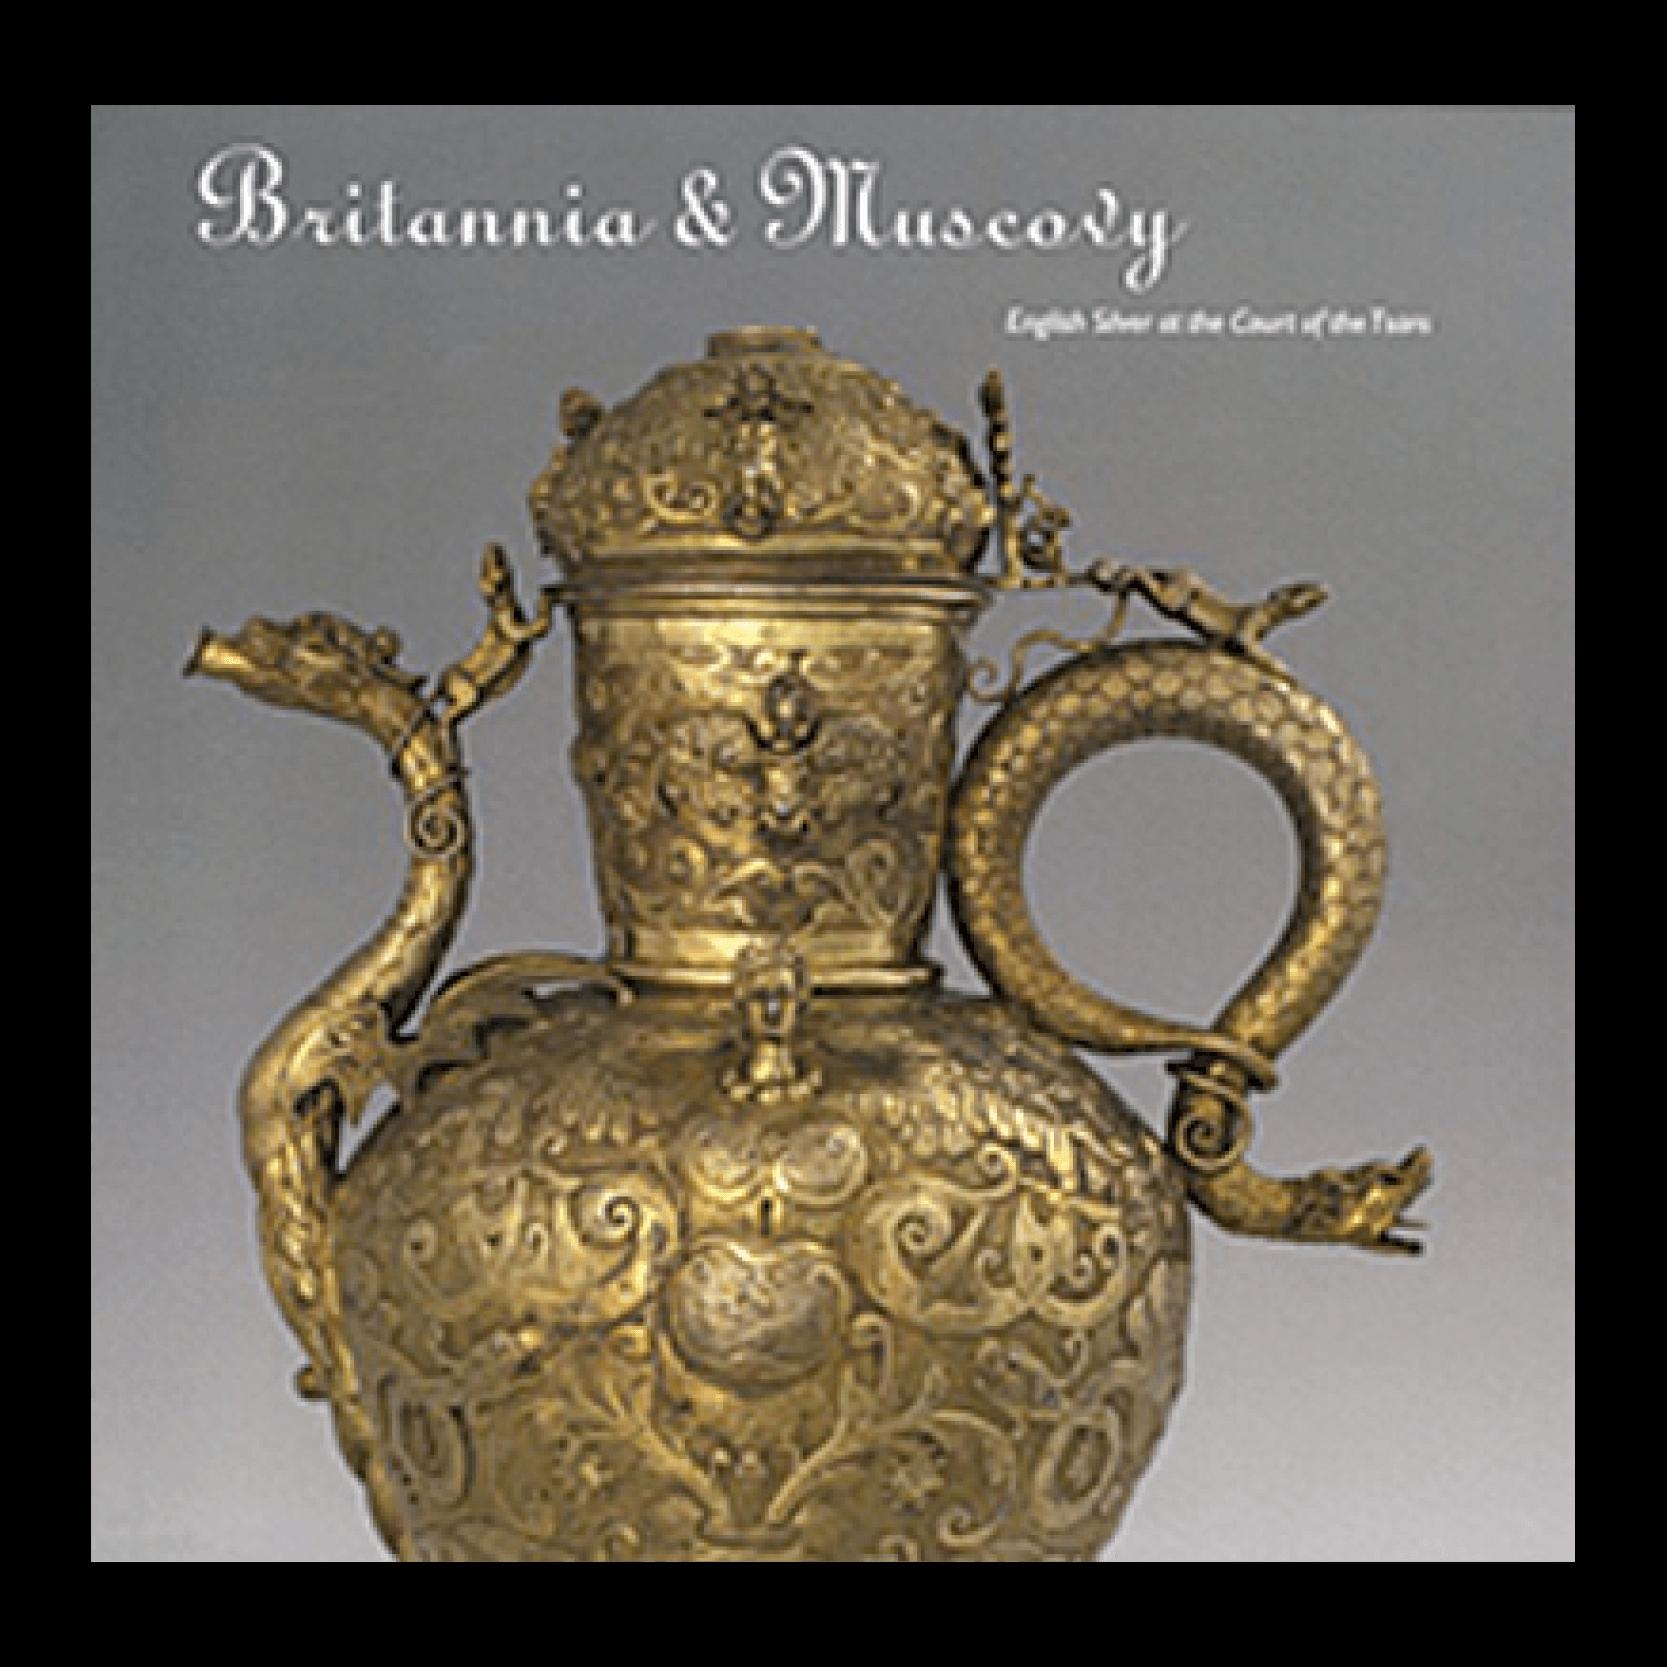 Britannia & Muscovy By Brian Allen & Irina Zagarodnaya